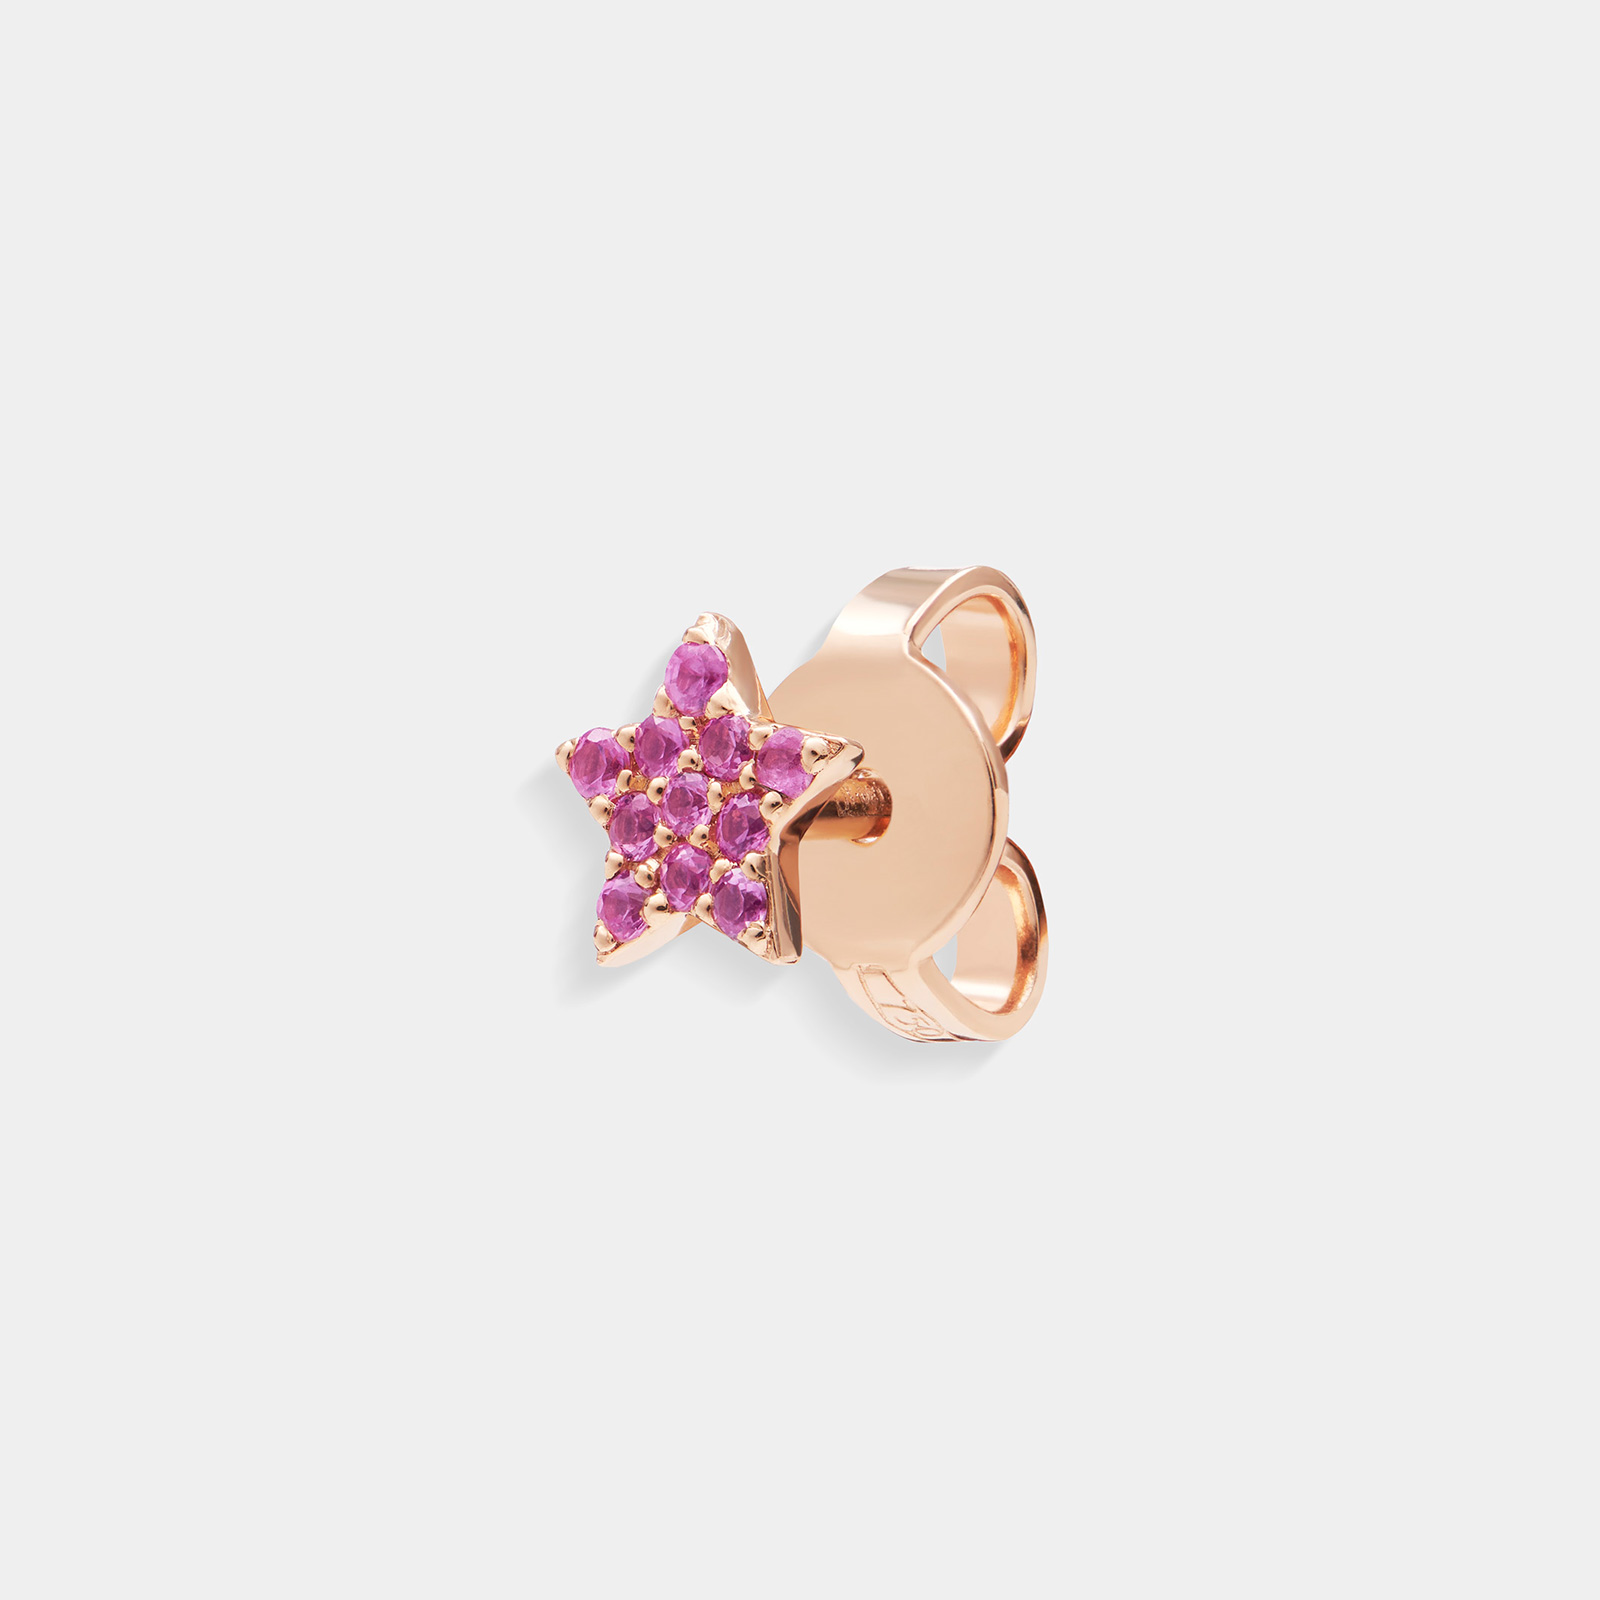 Mono orecchino stella in oro rosa e zaffiri rosa - Rosanna Cattolico gioielli